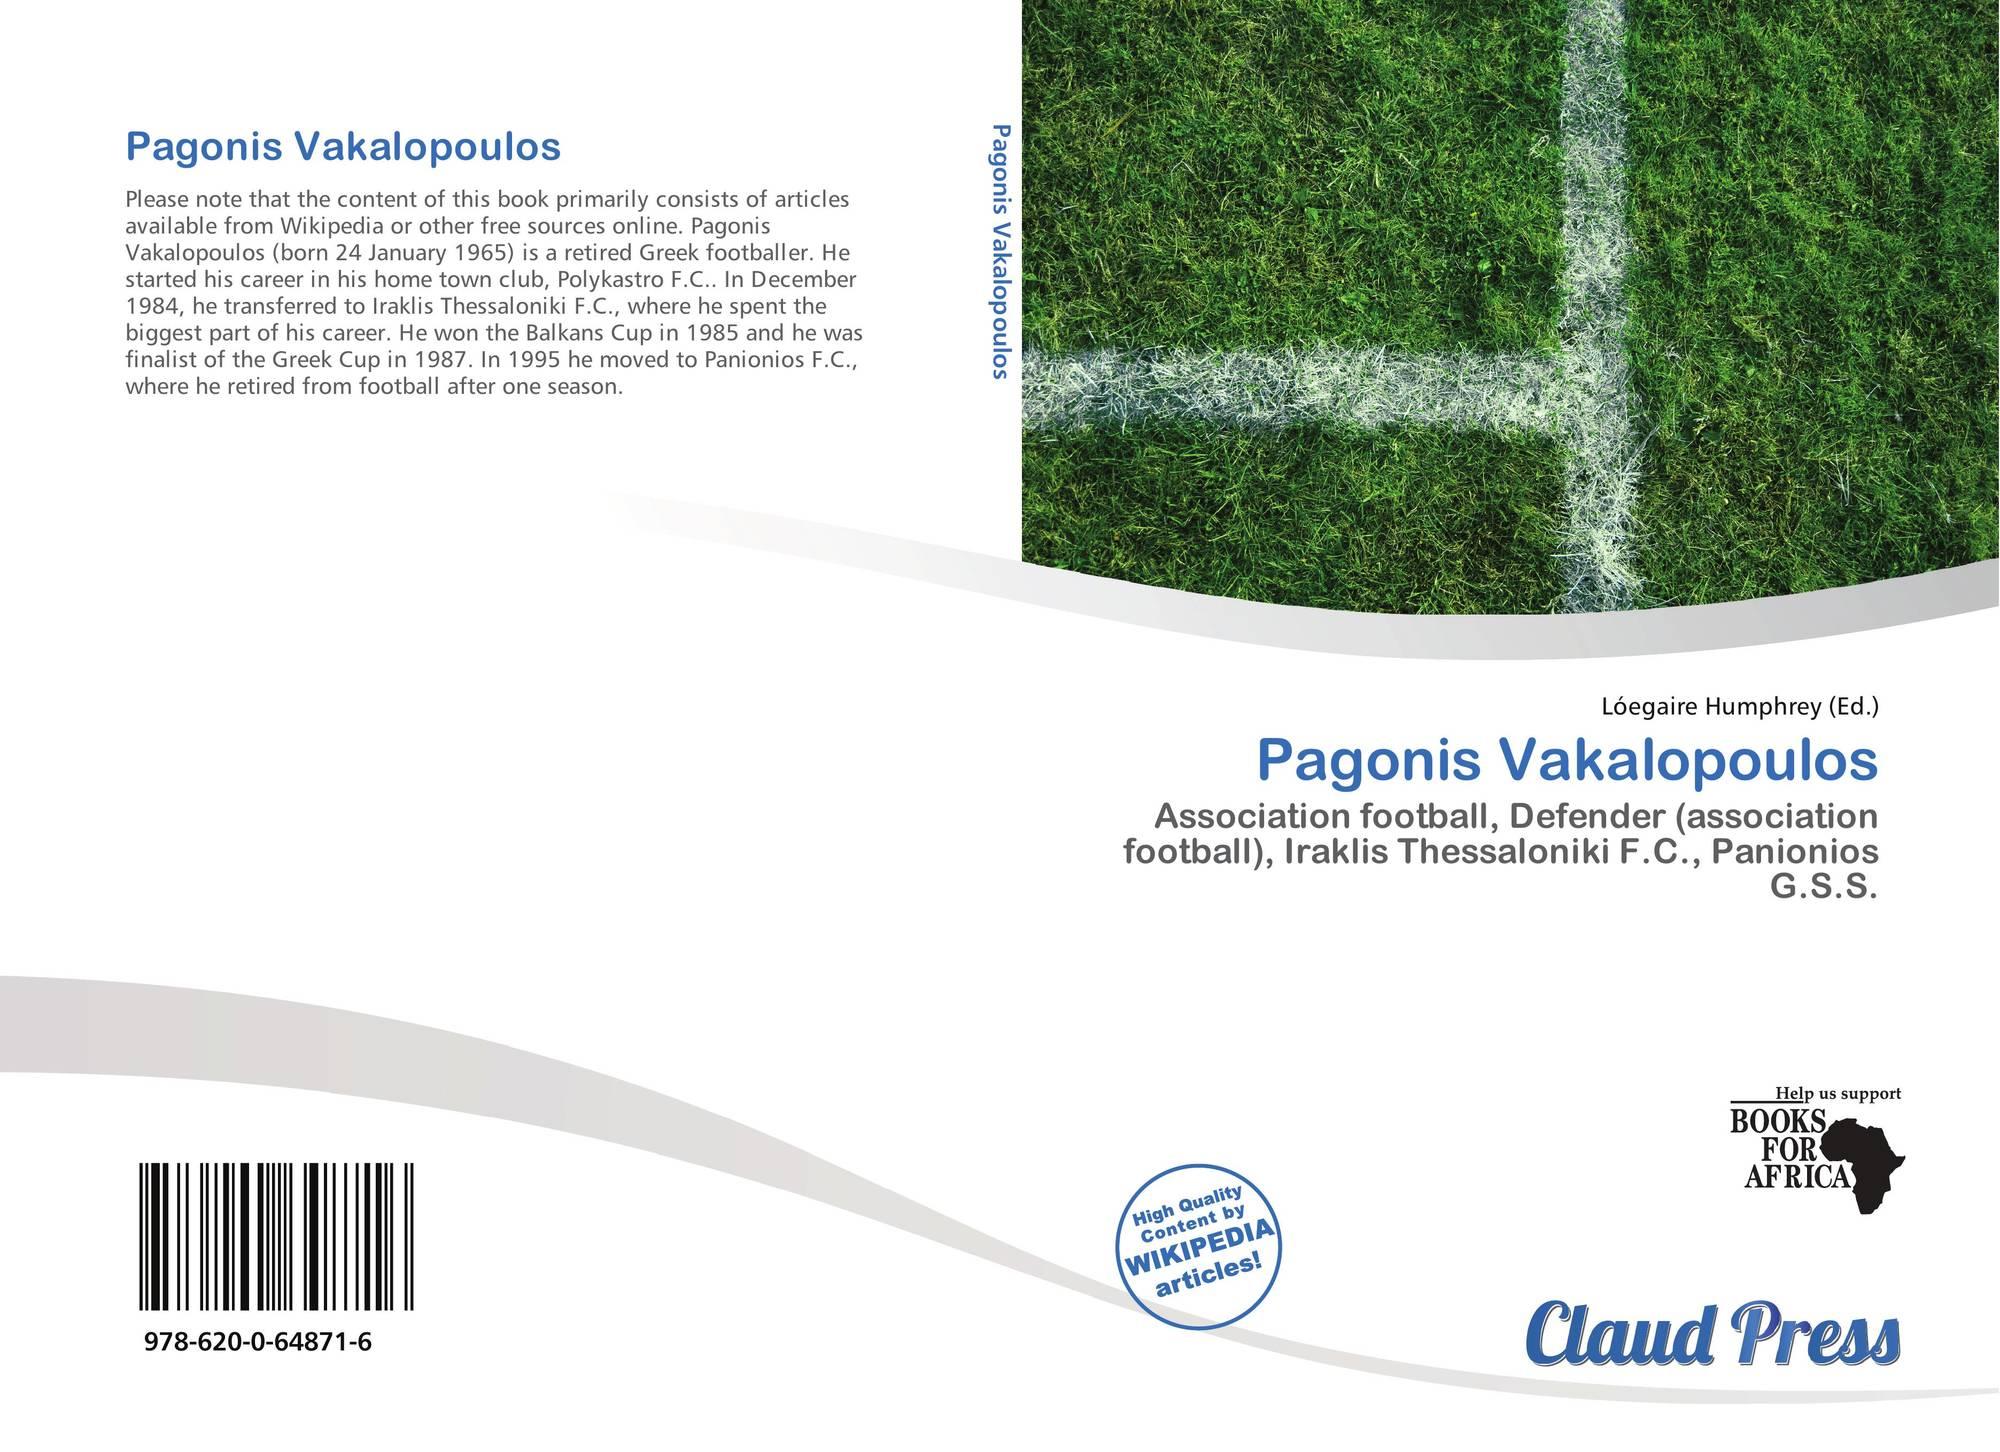 Pagonis Vakalopoulos Pagonis Vakalopoulos 9786200648716 6200648719 9786200648716